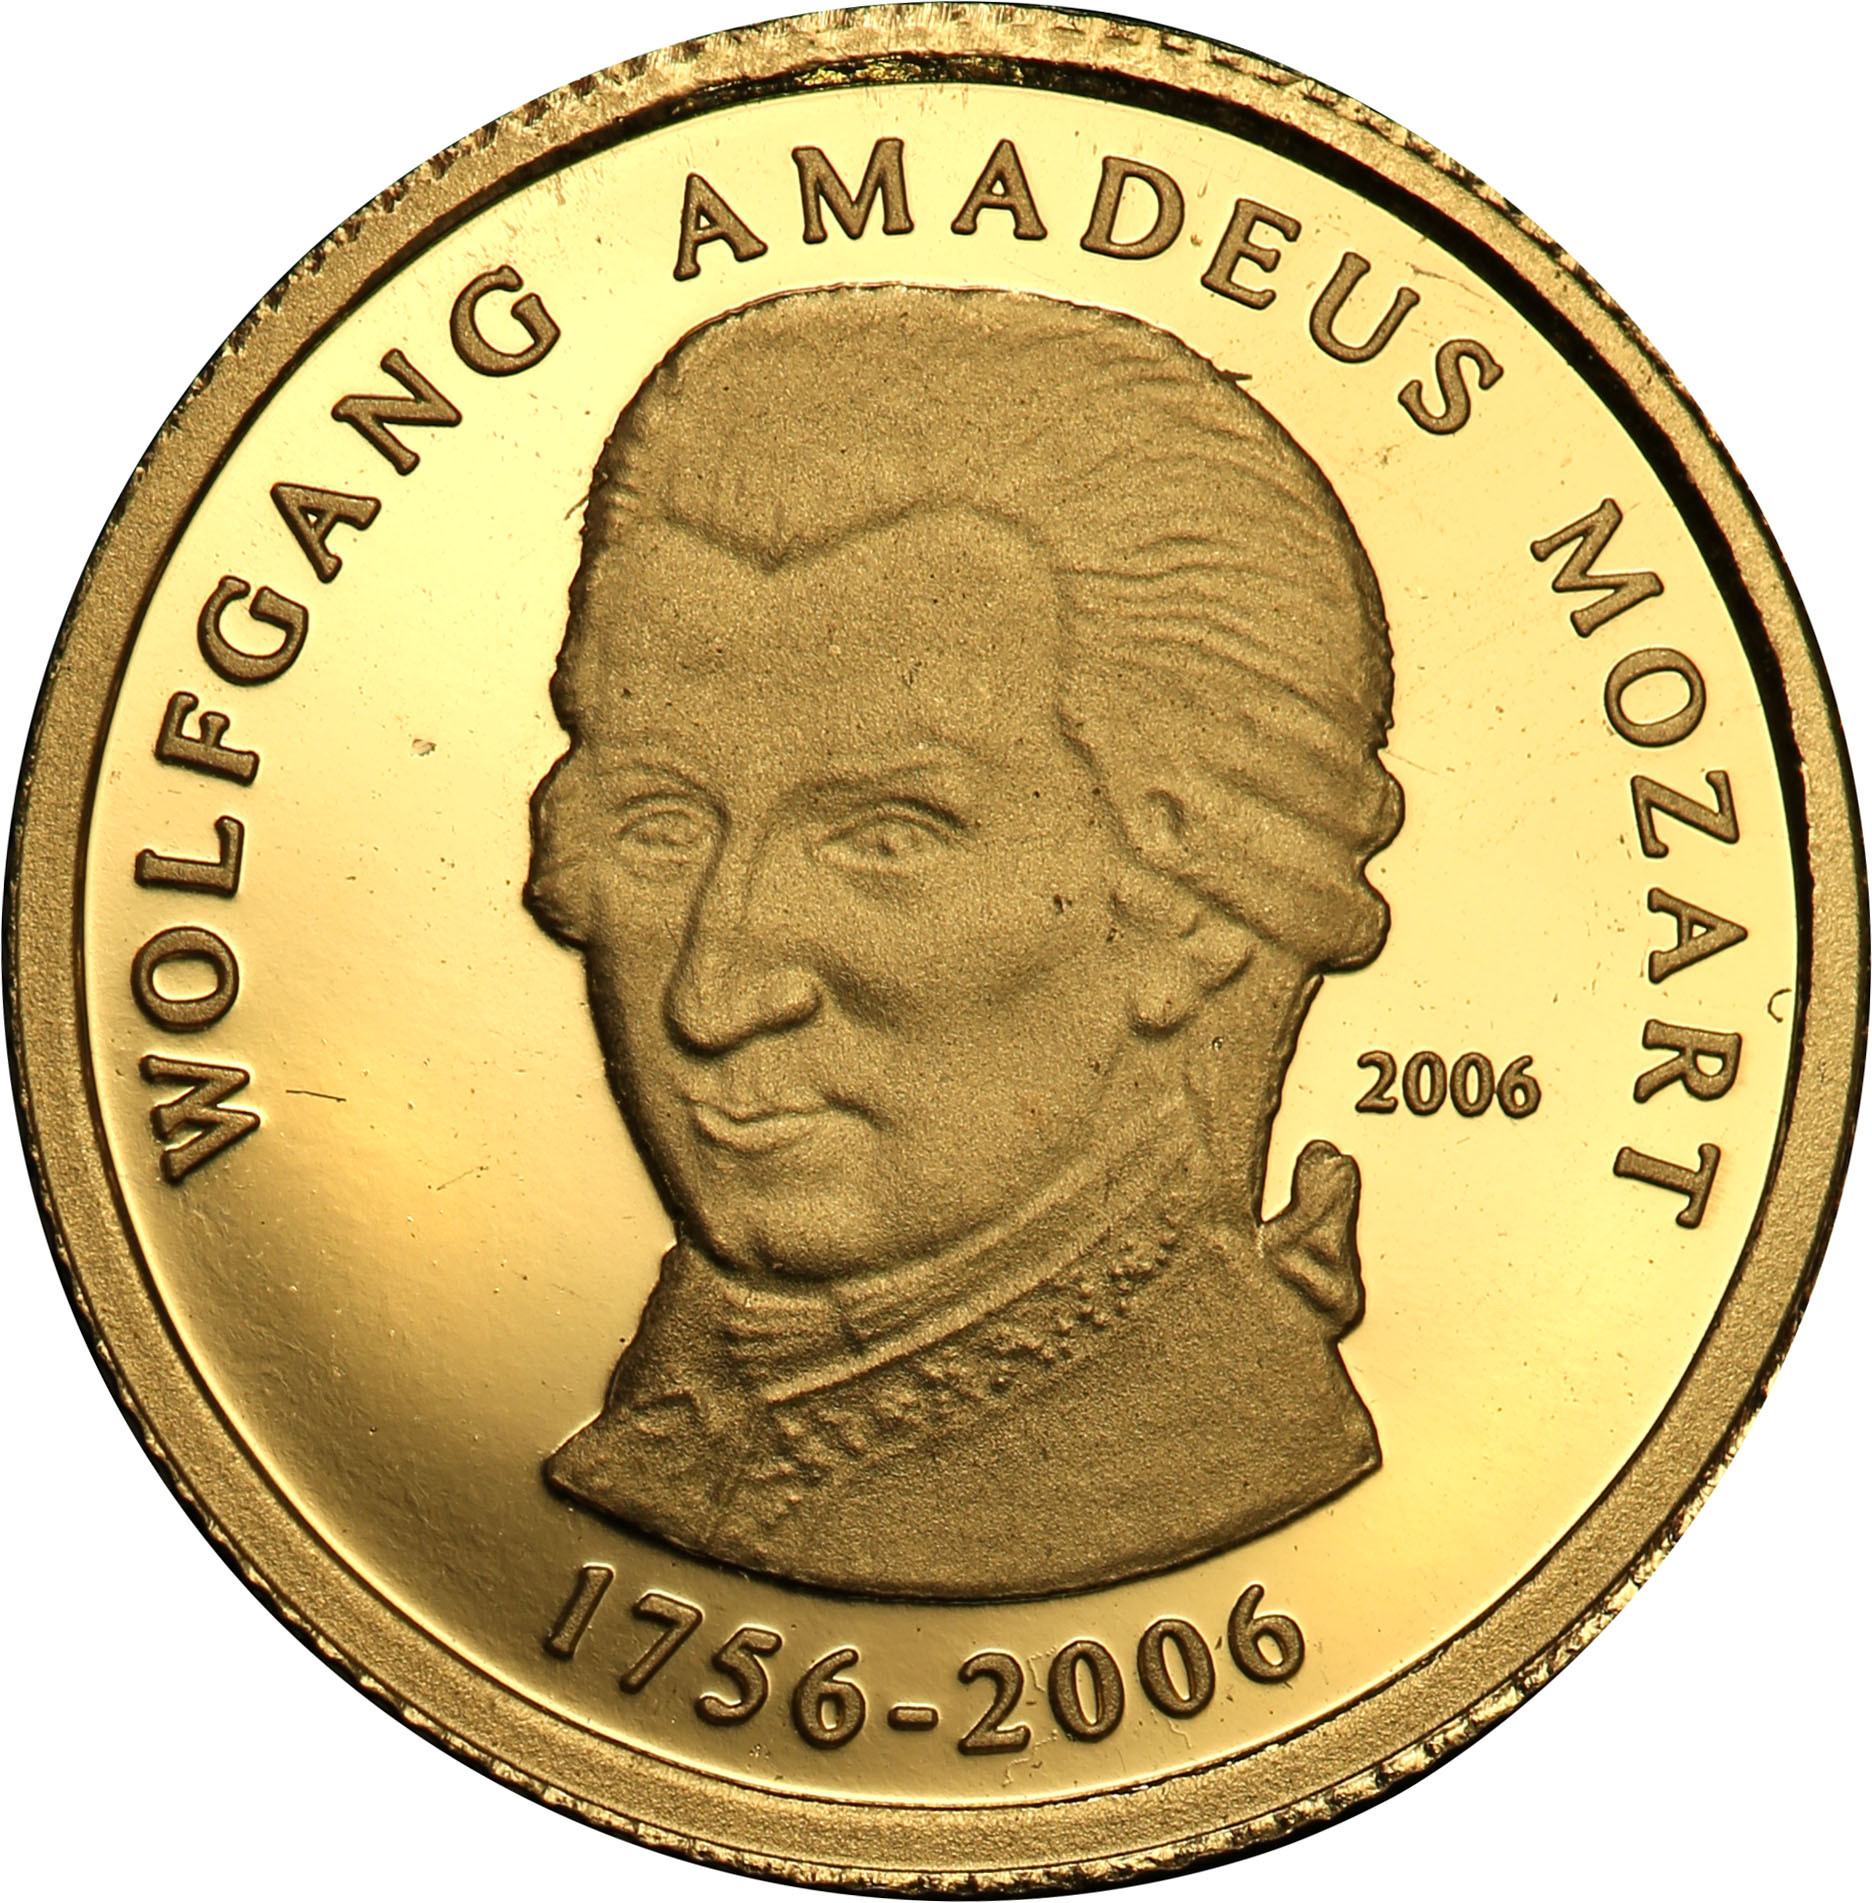 Rep. Togijska. 1500 franków 2006 Wolfang Amadeusz Mozart st.L